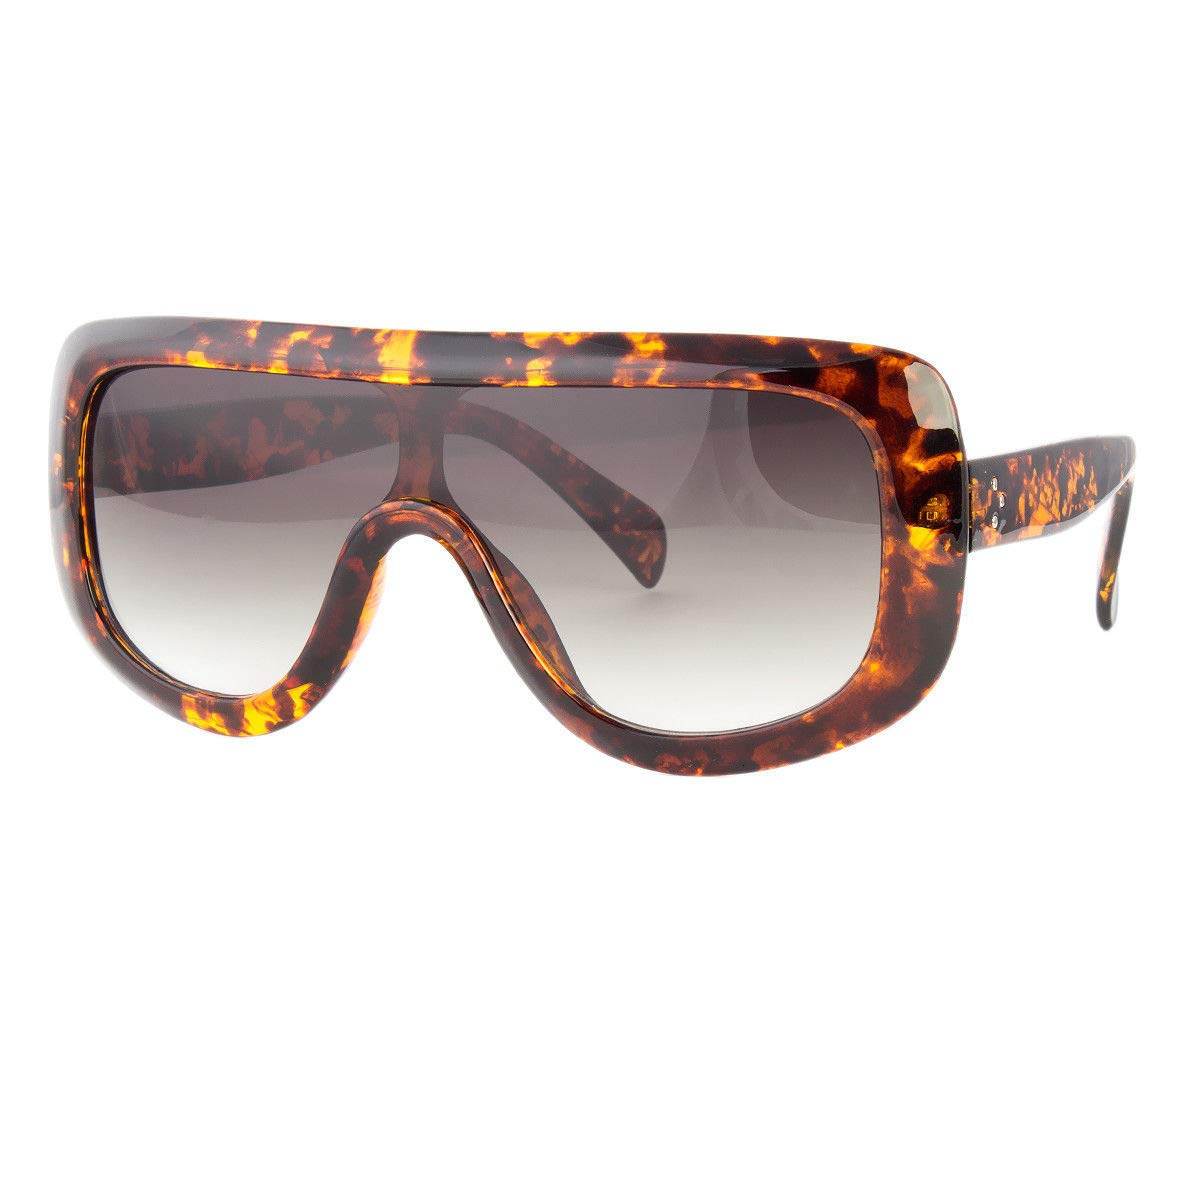 188453fbab1 Amazon.com  Large Oversized Square Sunglasses Gradient Lens Thick Retro  Frame Women Fashion  Clothing